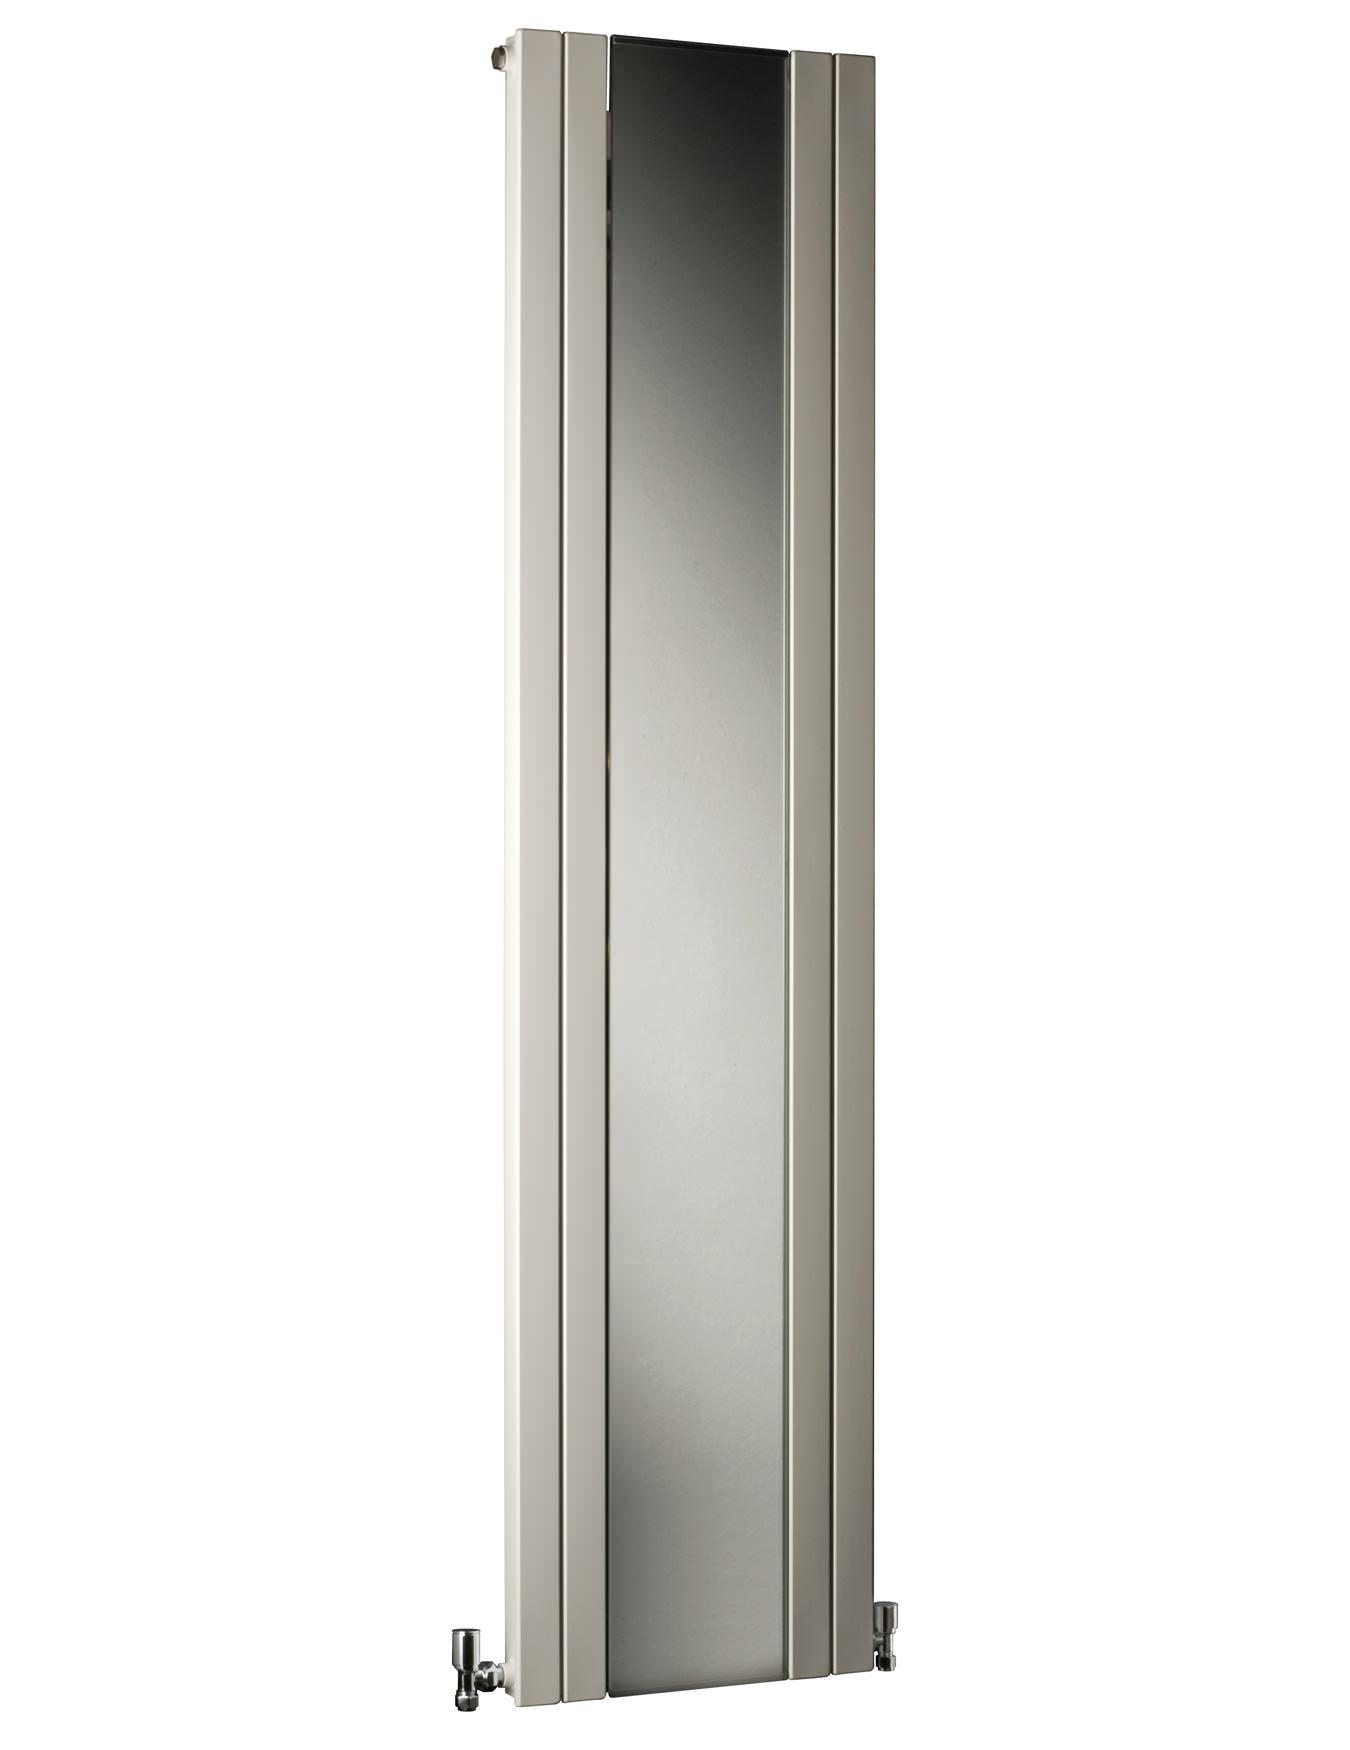 Dq heating rt mirror 4 panels vertical radiator 435 x 1800mm for Mirror radiator